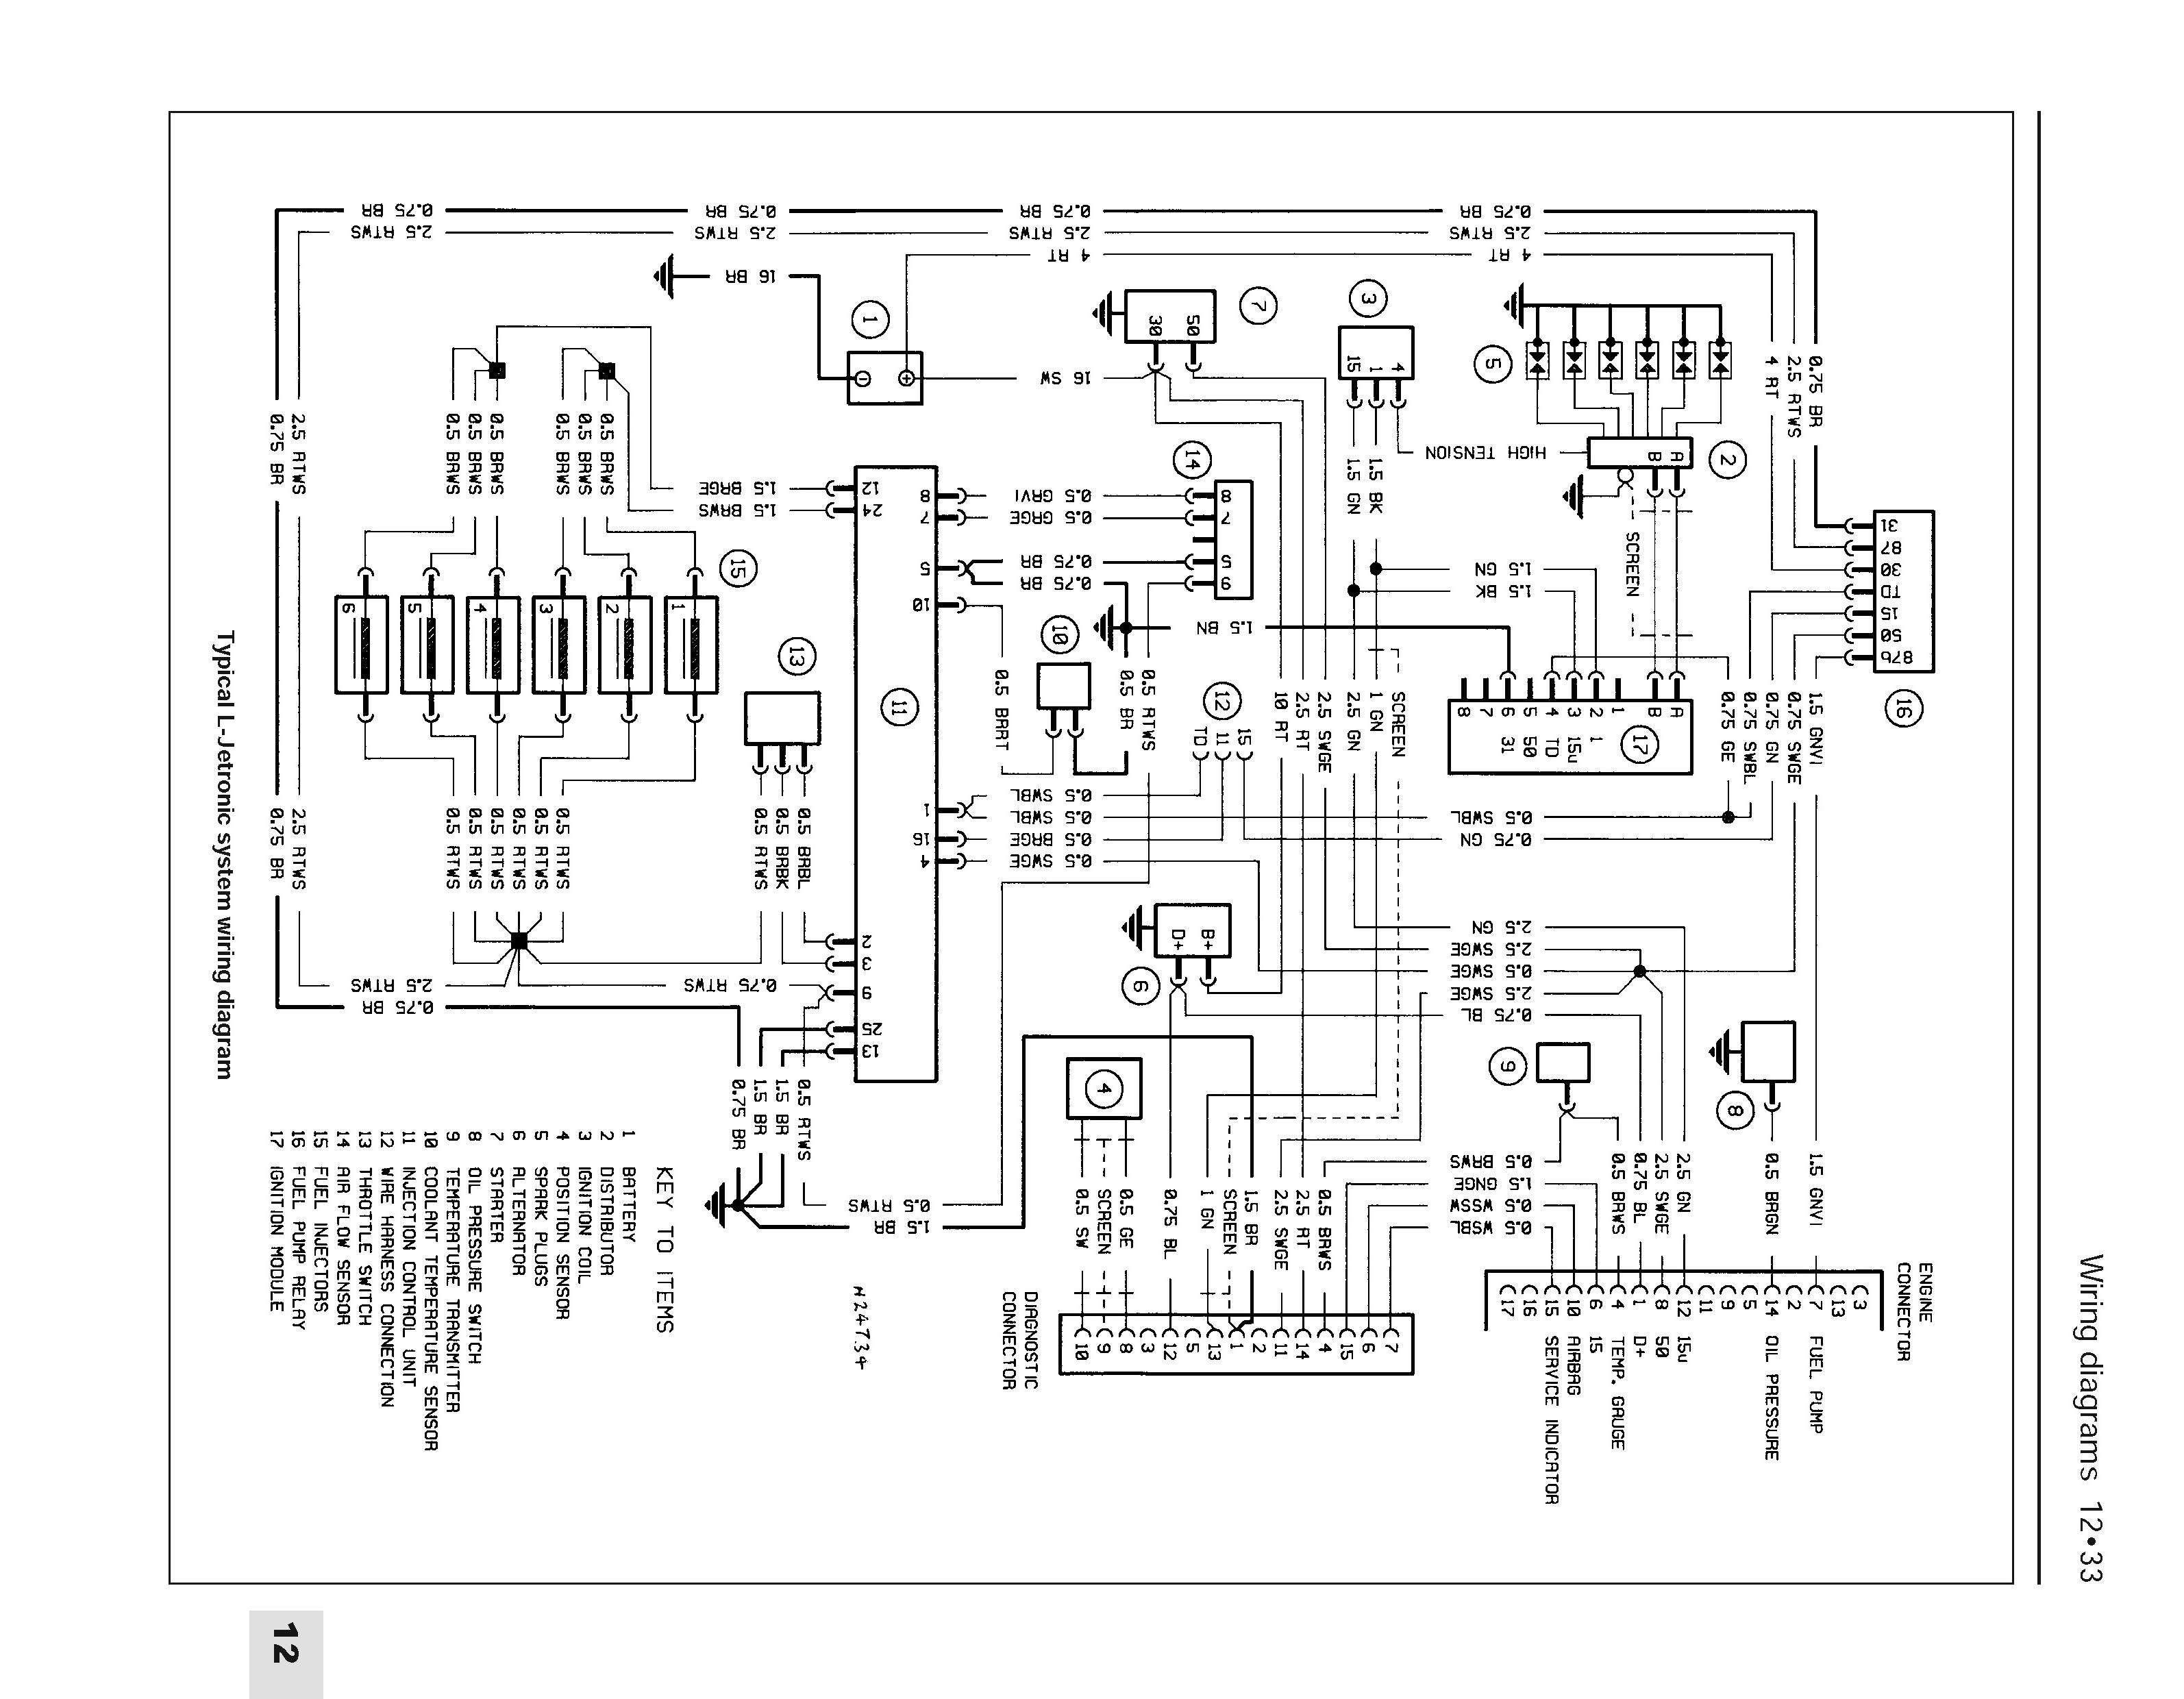 Bmw E30 Engine Wiring Diagram Image Details Vw